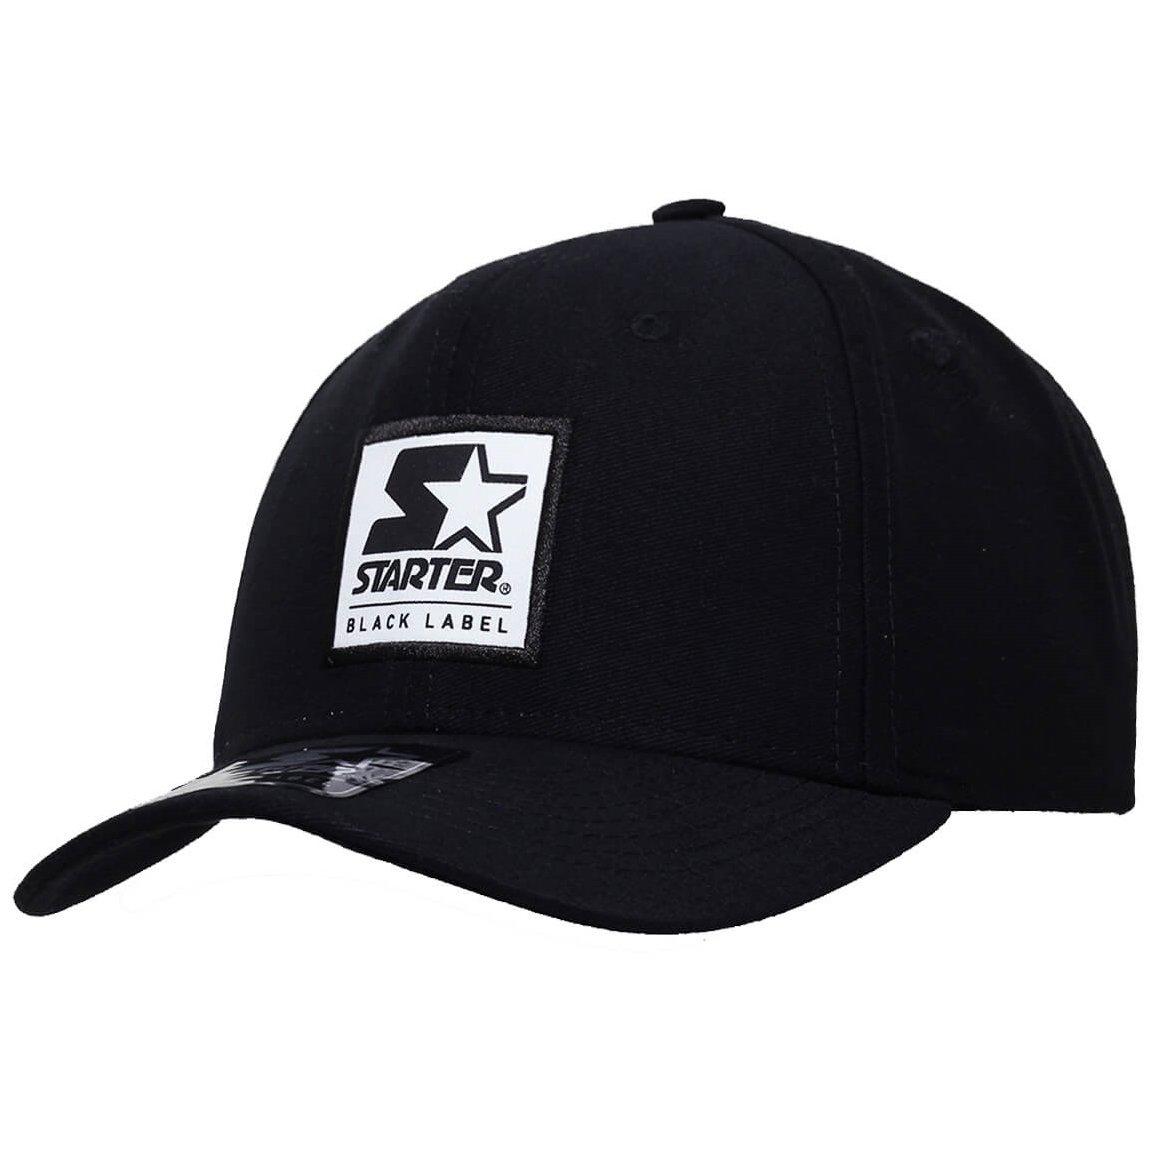 Boné Starter Aba Curva Snapback Black Label - Compre Agora  179a0211233